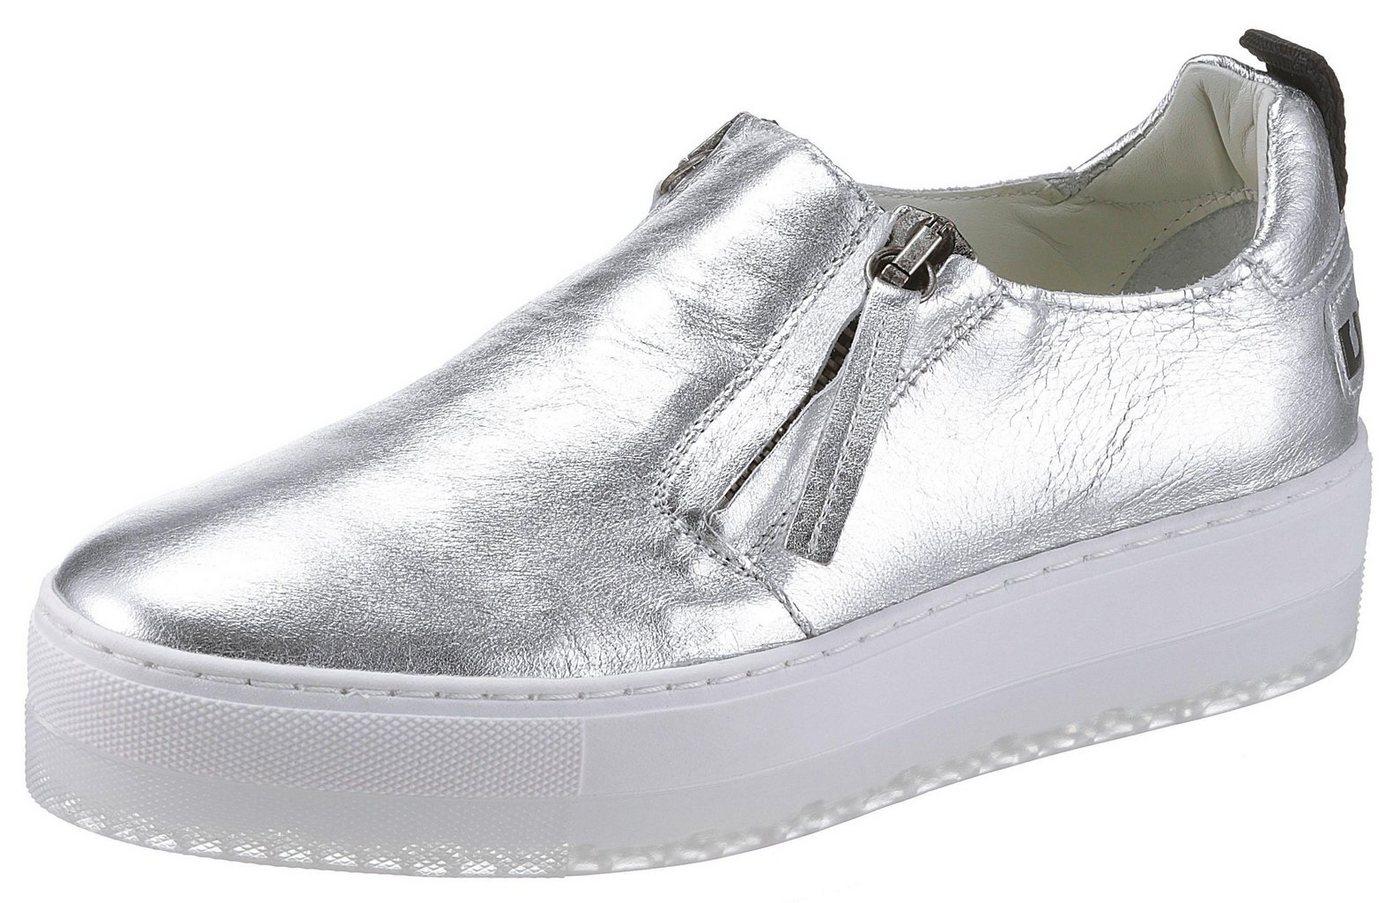 diesel -  »Lenglas S-Lenglas Slip On« Slip-On Sneaker mit 2 Reißverschlüssen